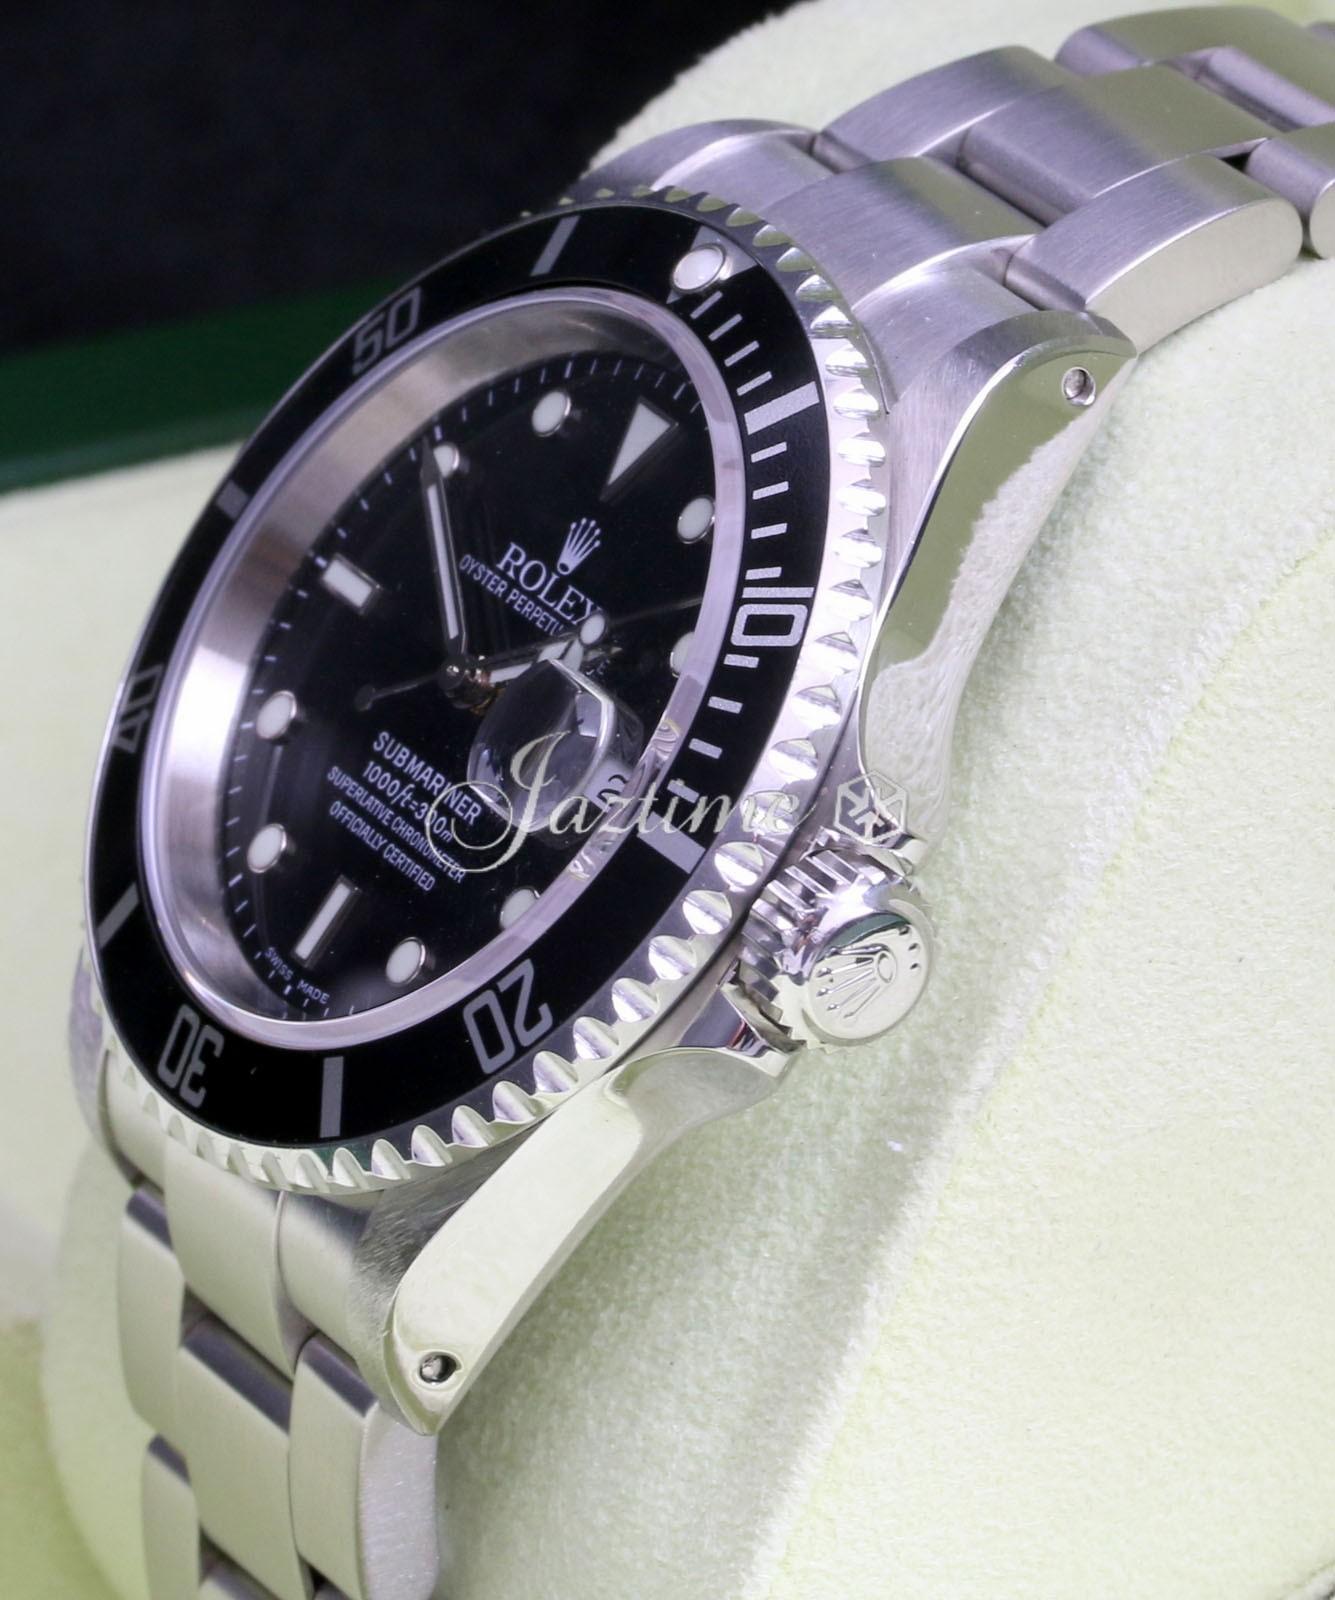 Rolex 16610 Submariner Black » for SALE